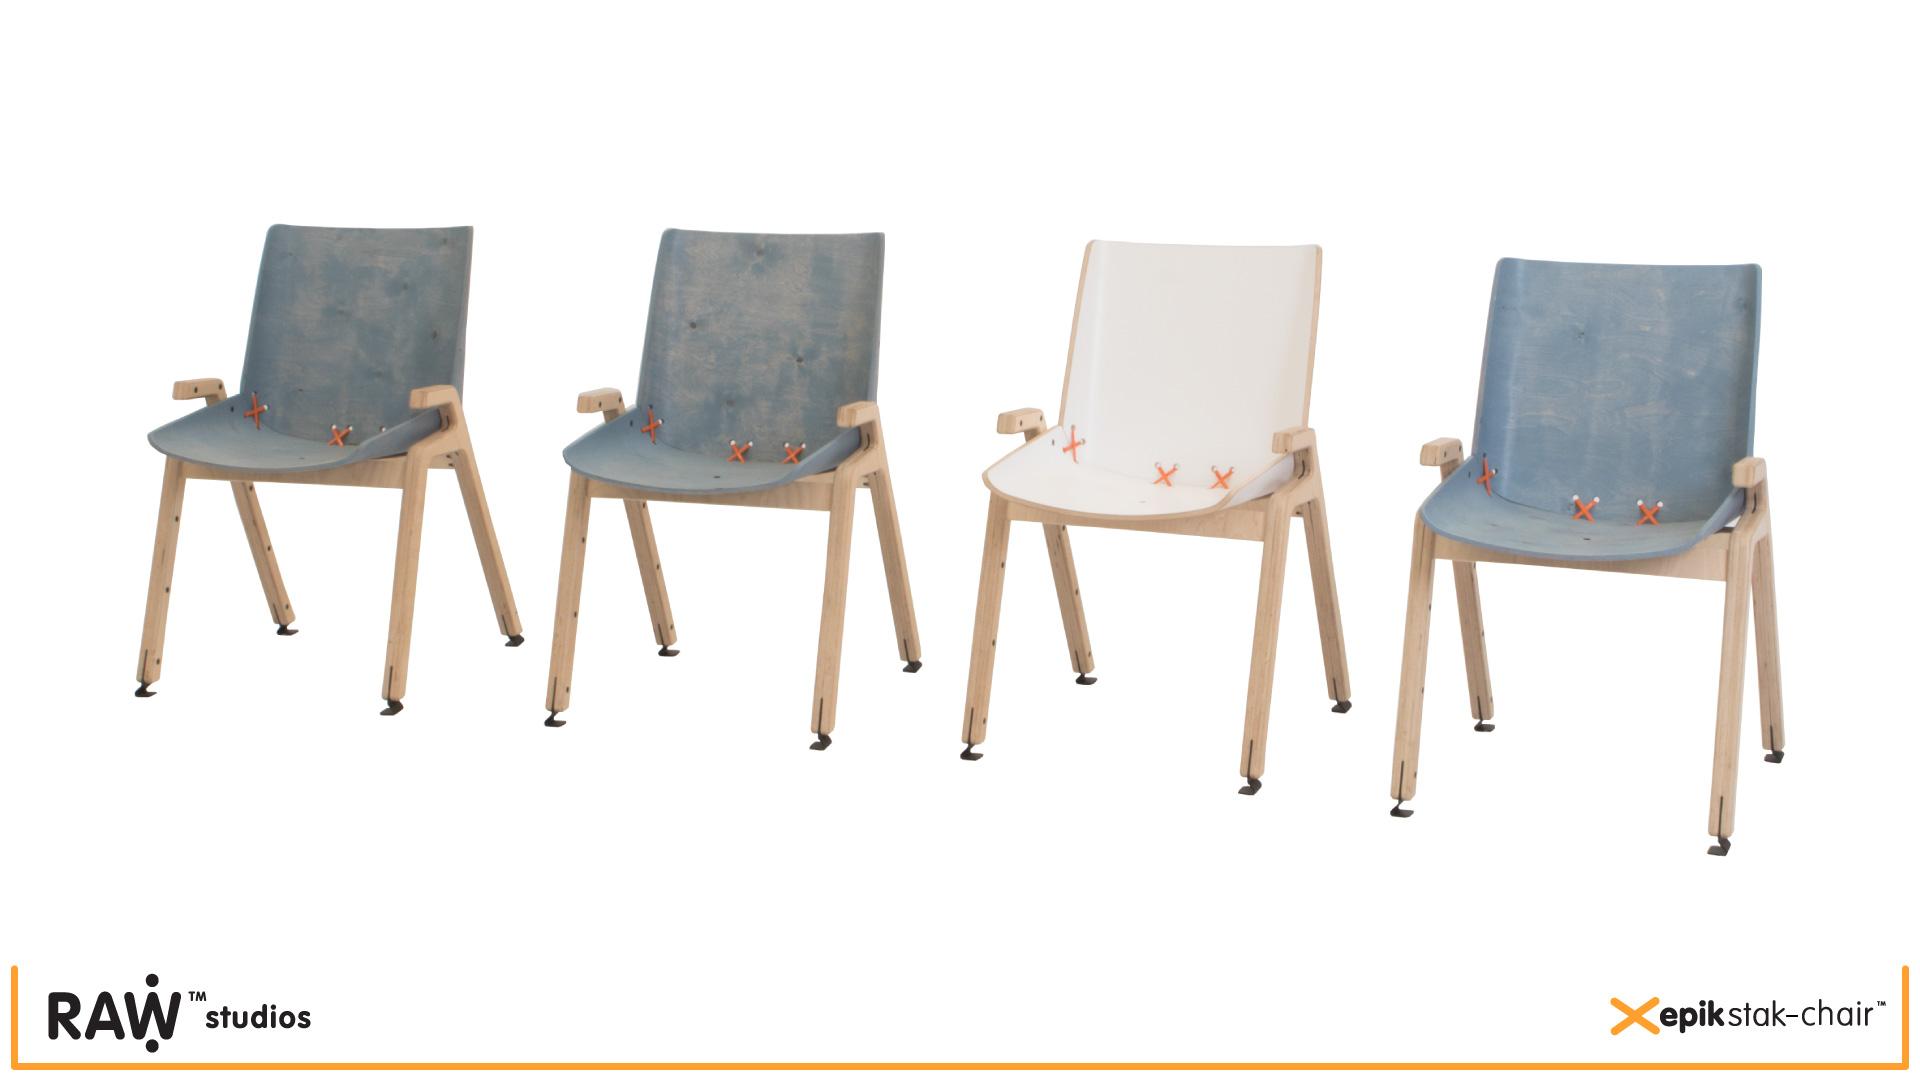 RAW Work_epik stak-chair